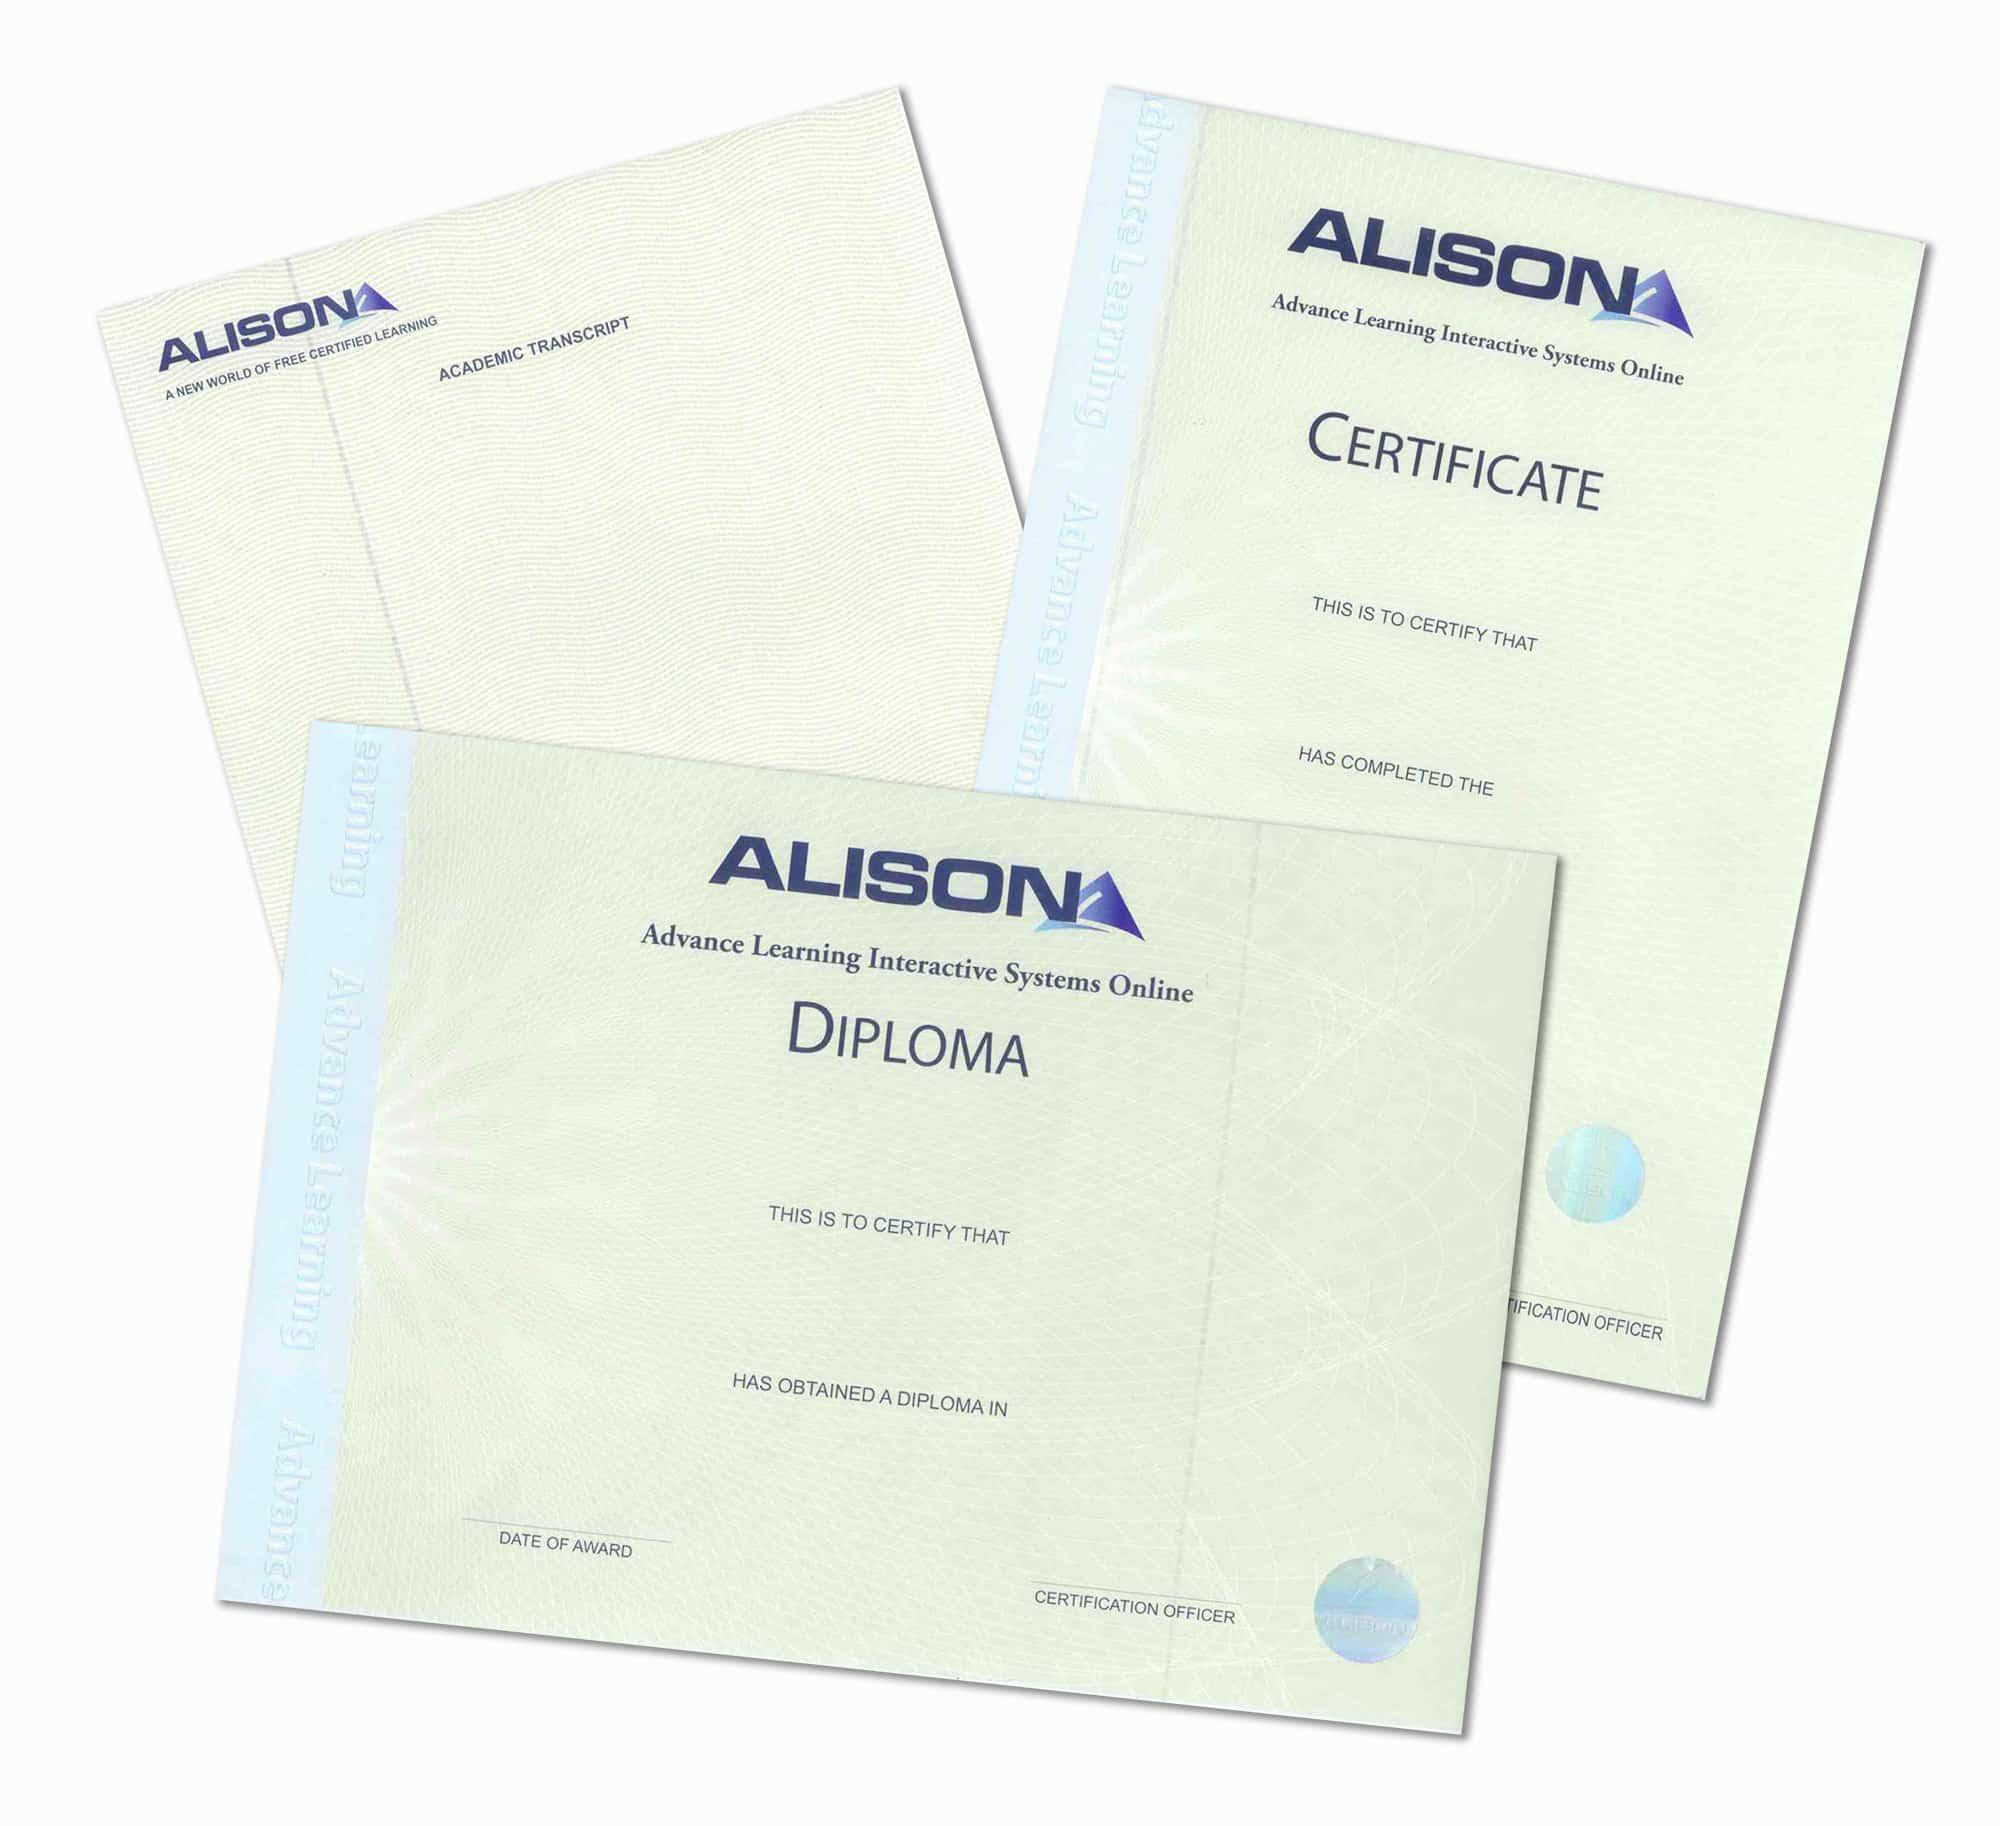 alison diploma certificate sample gallery certificate design and  alison diploma certificate sample image collections certificate alison diploma certificate sample image collections certificate alison diploma